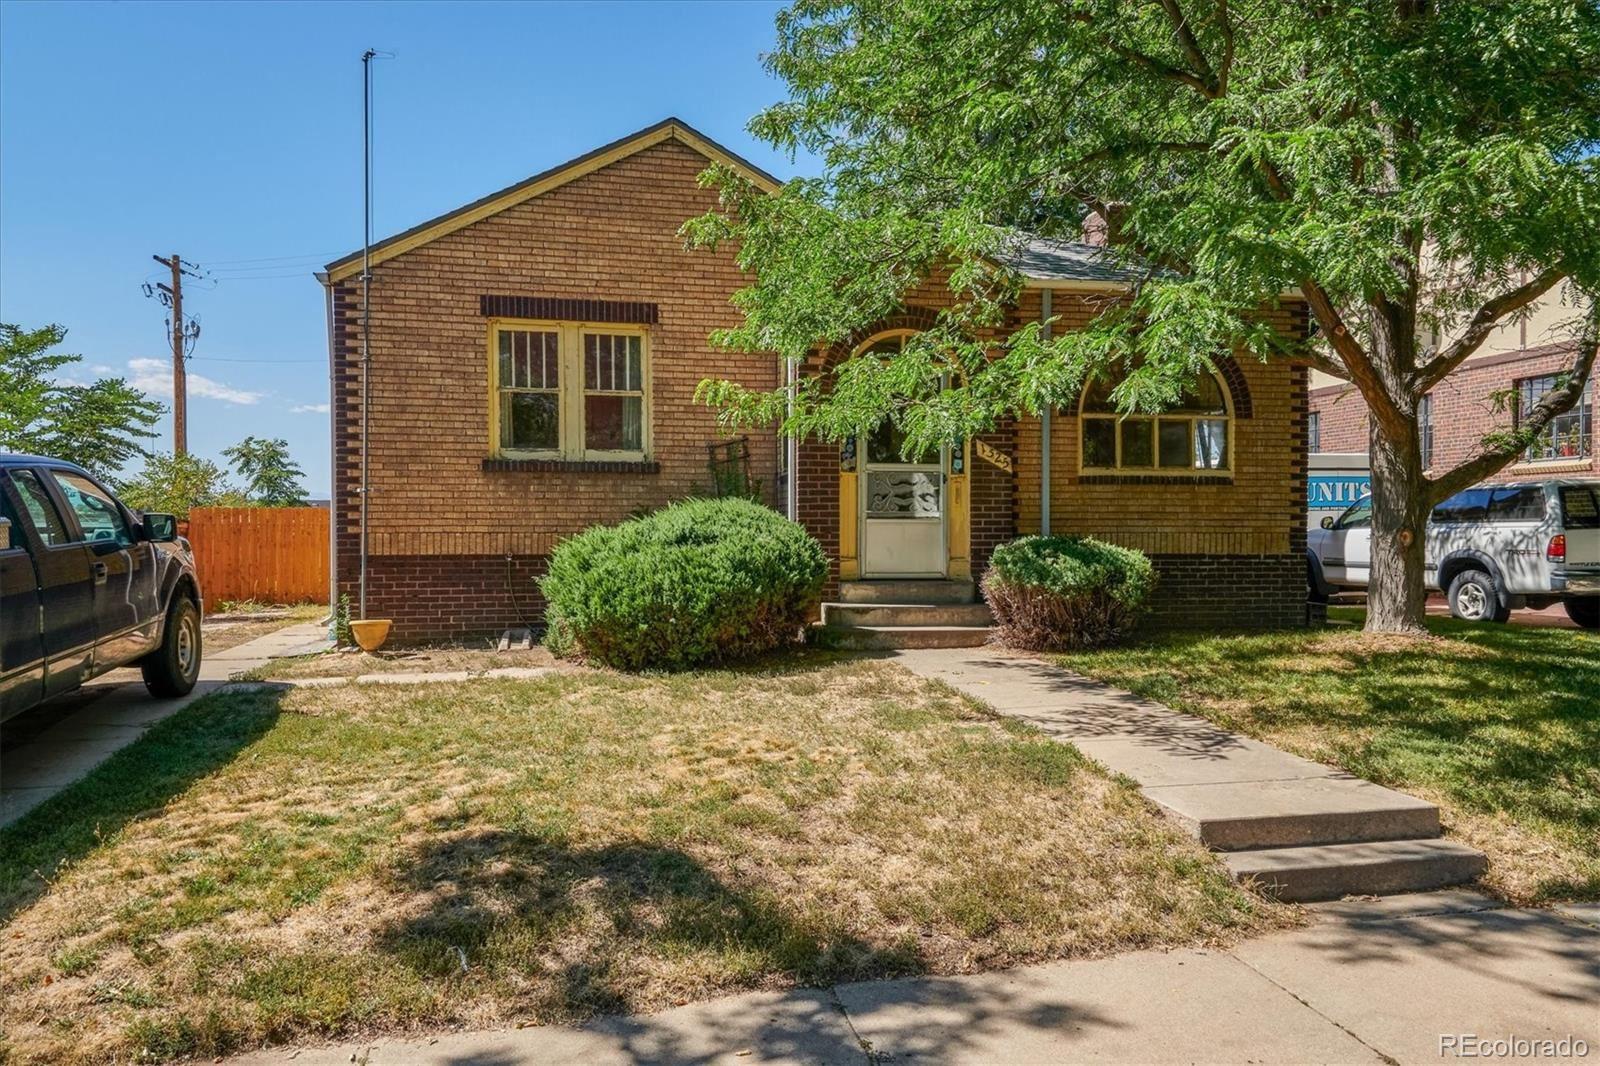 Photo of 1525 Jasmine Street, Denver, CO 80220 (MLS # 6360594)